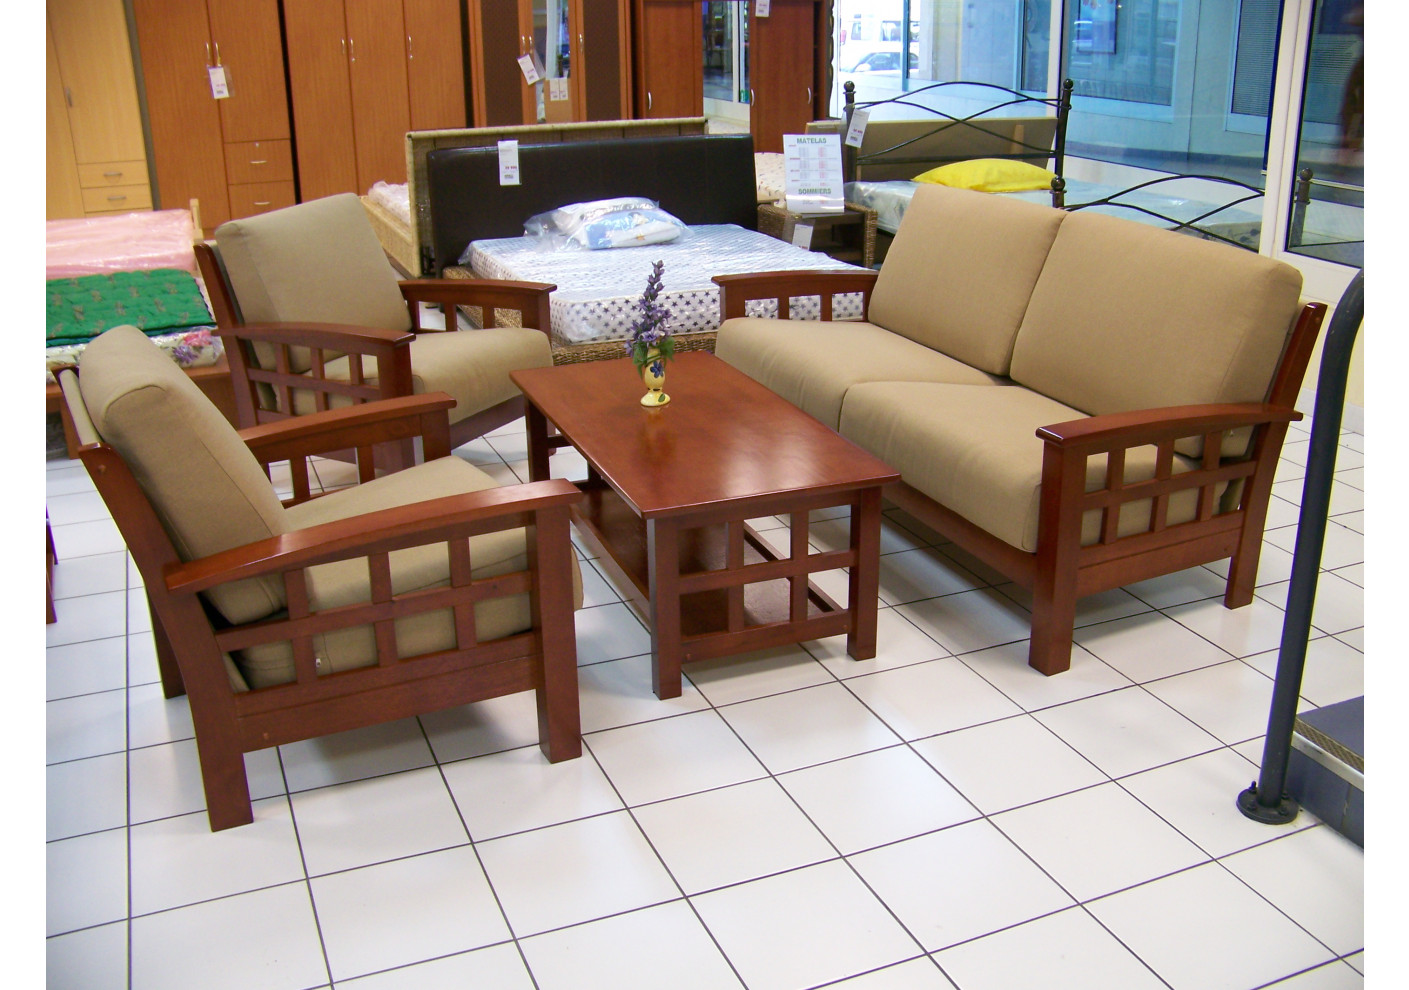 salon 4 pi ces osaka cappuccino microfibre olive 1 canap 3 places 2 fauteuils 1 table. Black Bedroom Furniture Sets. Home Design Ideas